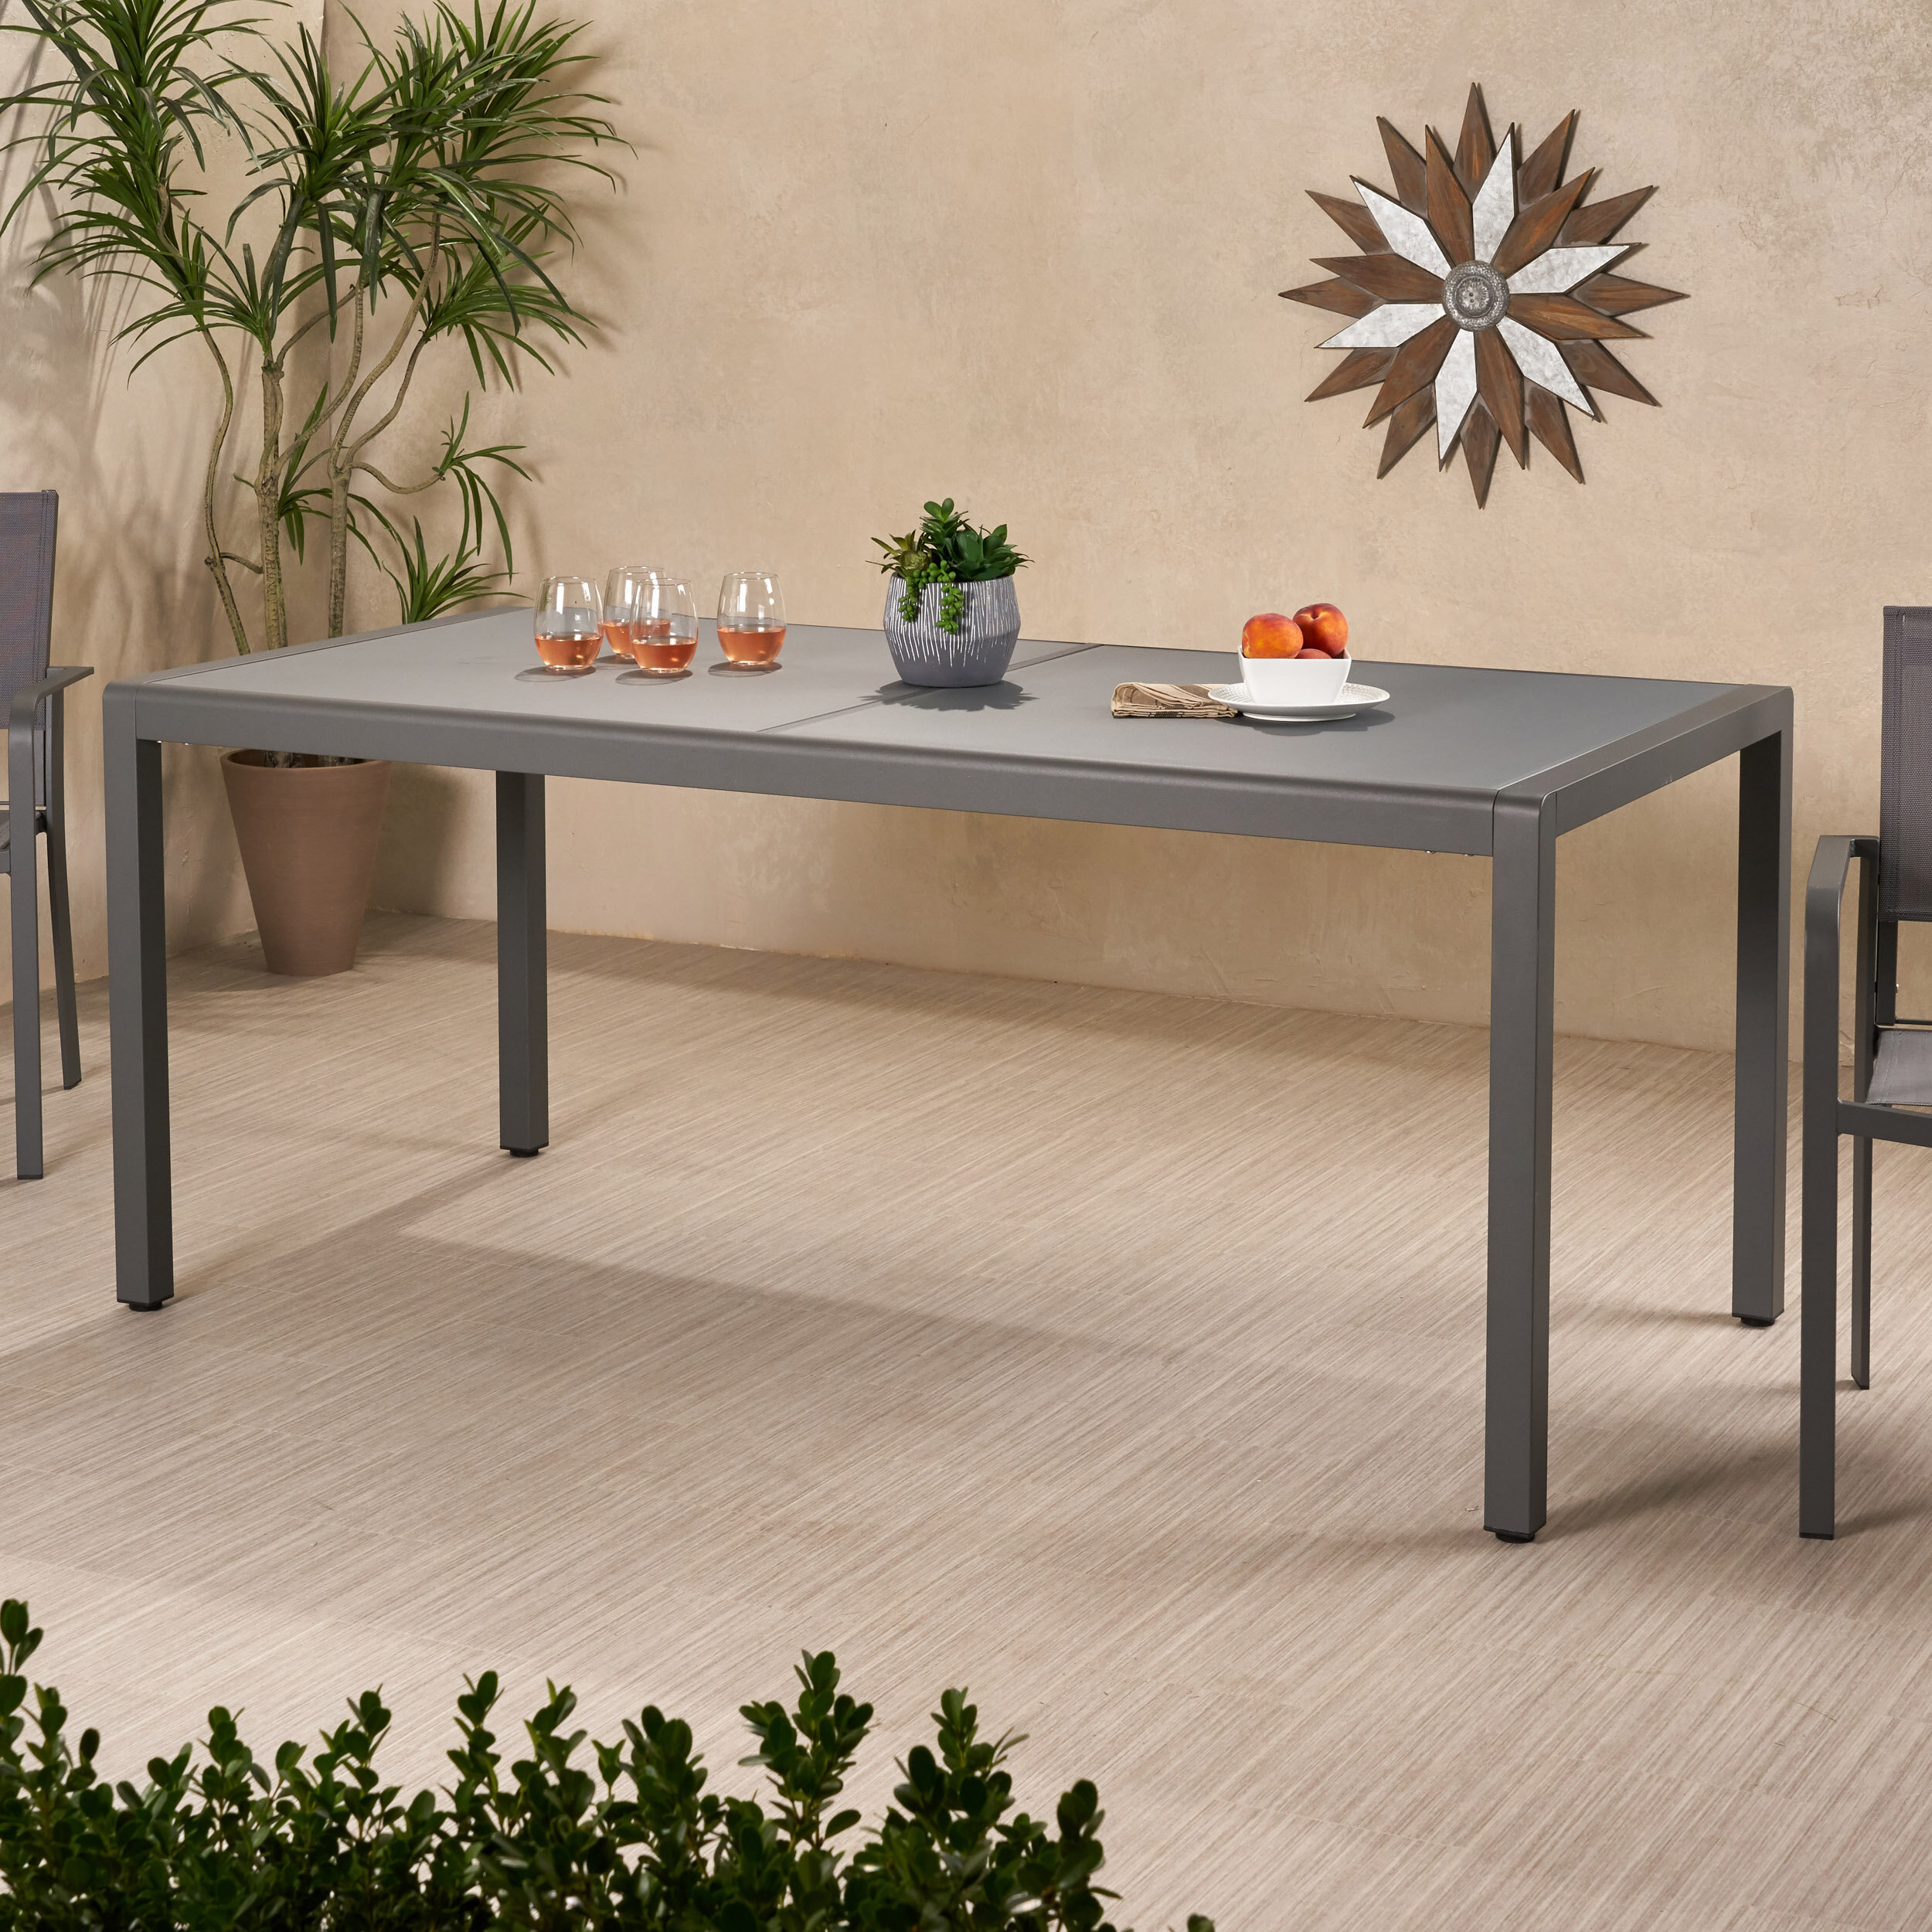 Brayden Studio Durbin Aluminum Grey Patio Dining Table Reviews Wayfair Ca